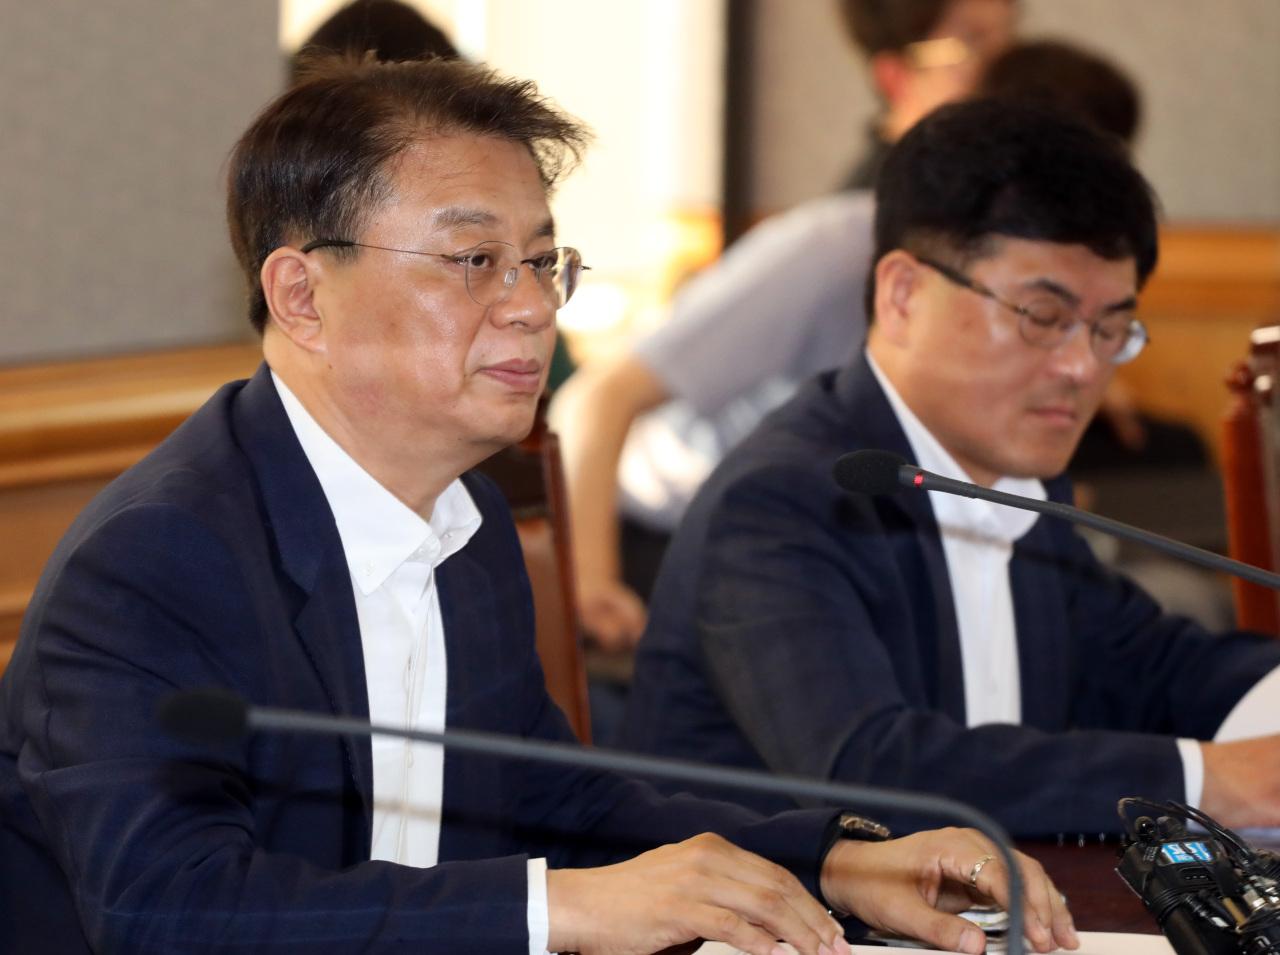 Deputy Minister of Economy and Finance Bang Ki-sun. (Yonhap)